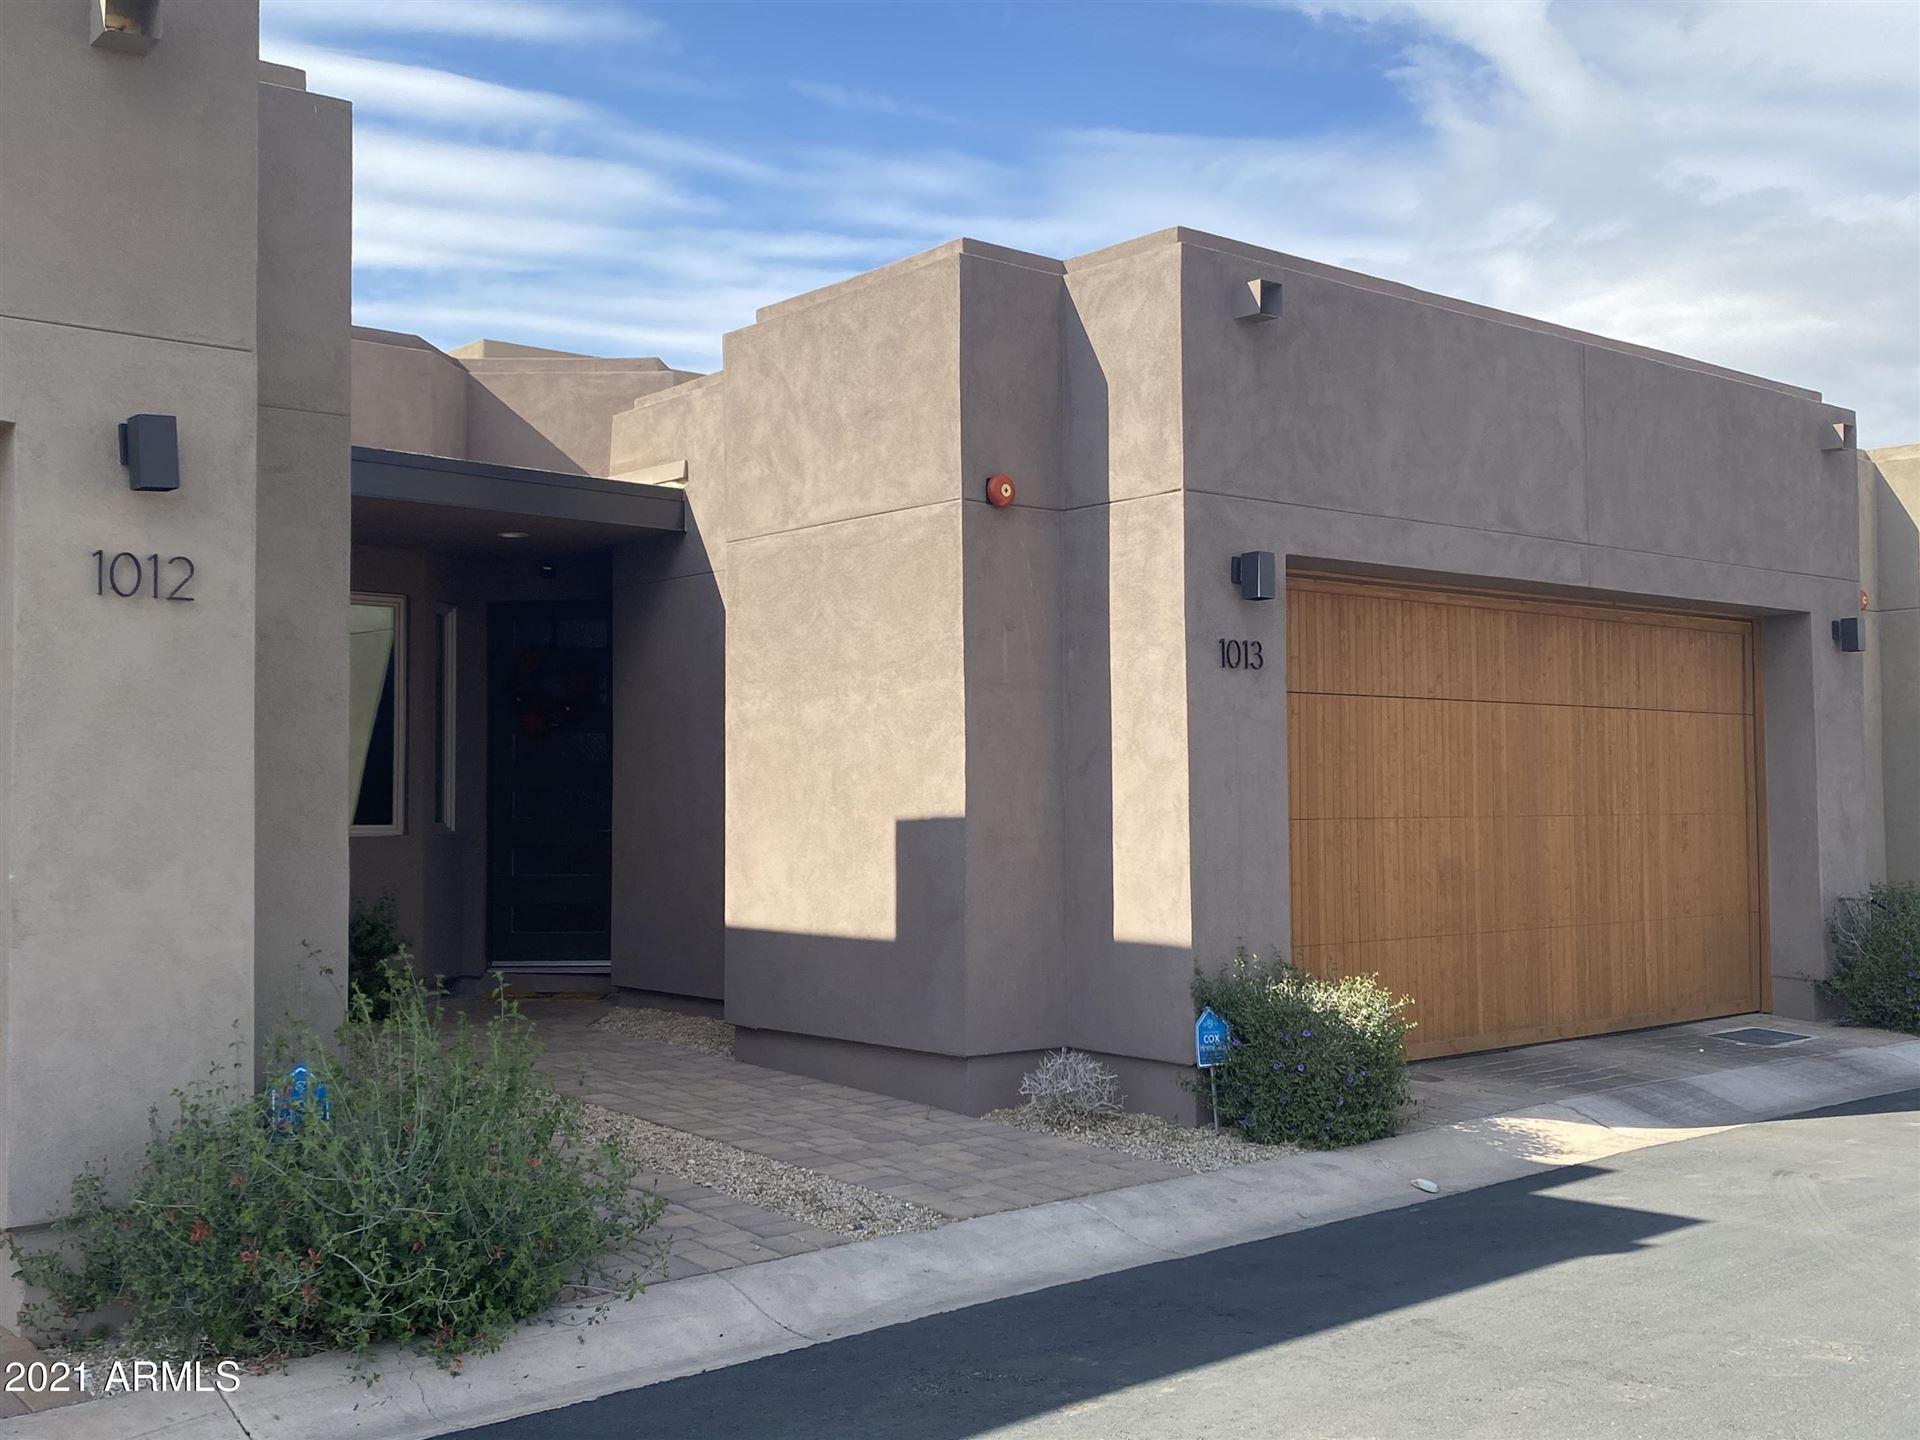 Photo of 9850 E MCDOWELL MOUNTAIN RANCH Road N #1013, Scottsdale, AZ 85260 (MLS # 6190693)